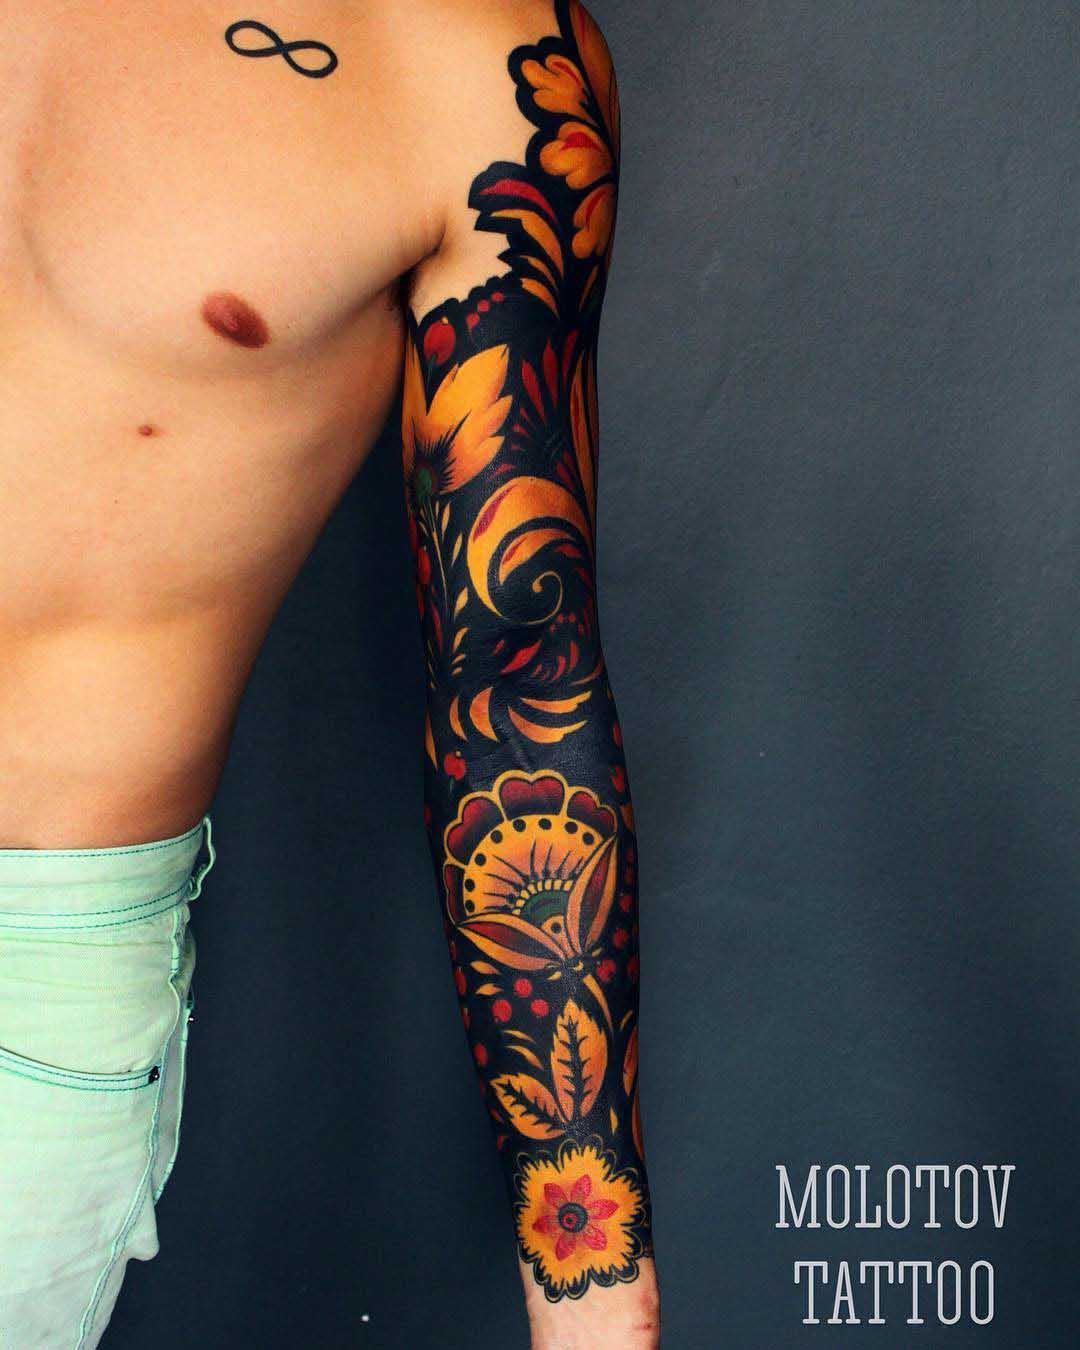 Super cool russian ornament sleeve tattoo it definitely reminds me